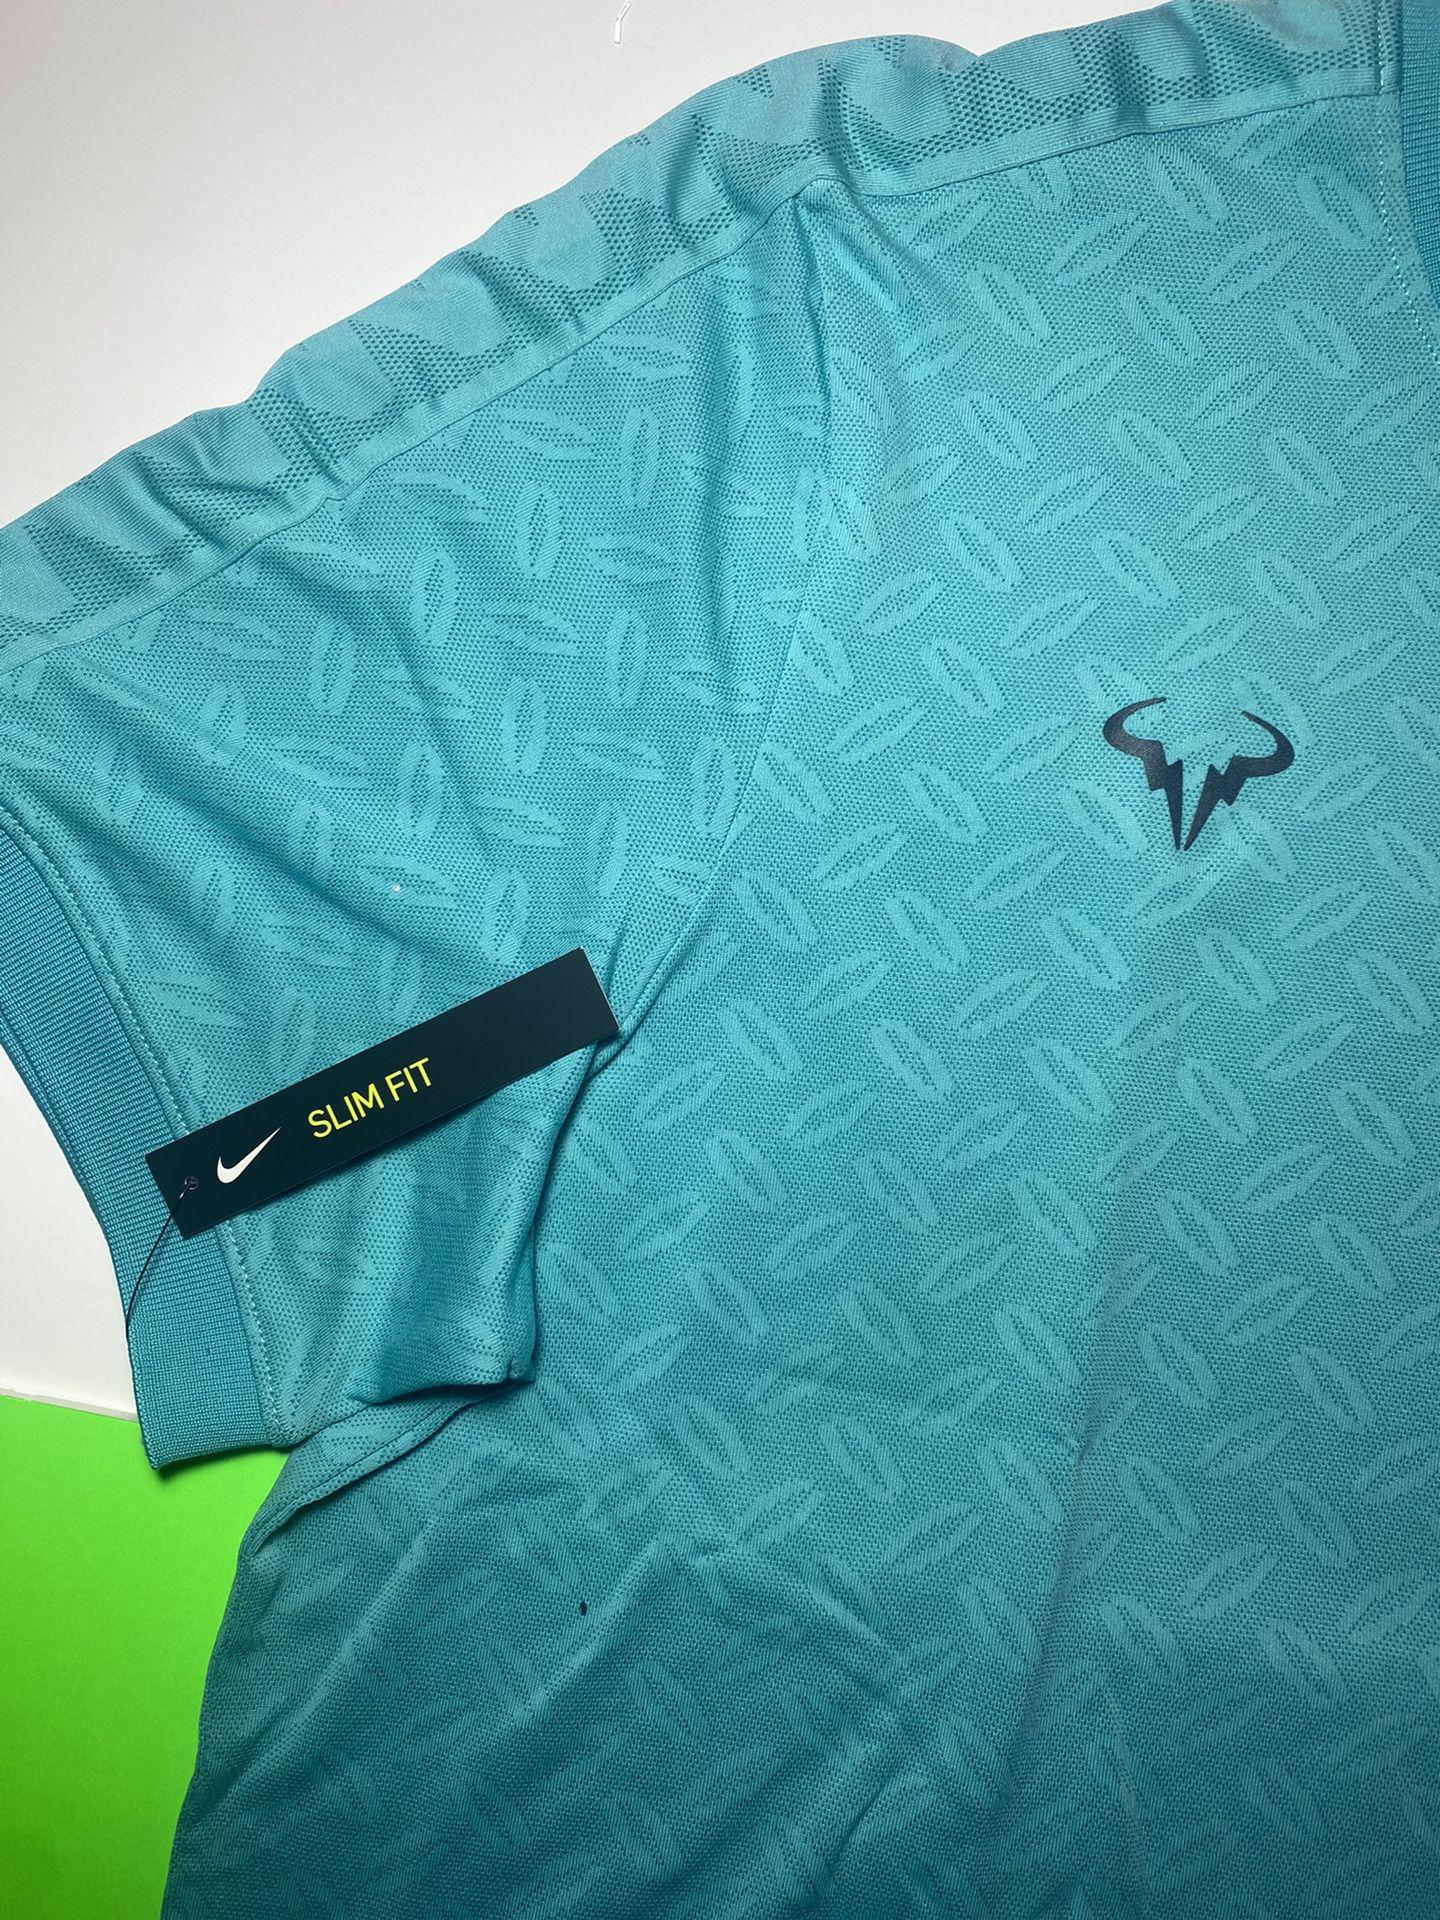 Men's Nike NikeCourt AeroReact Rafa Tennis Shirt Hyper Jade AT4182-317 Size L